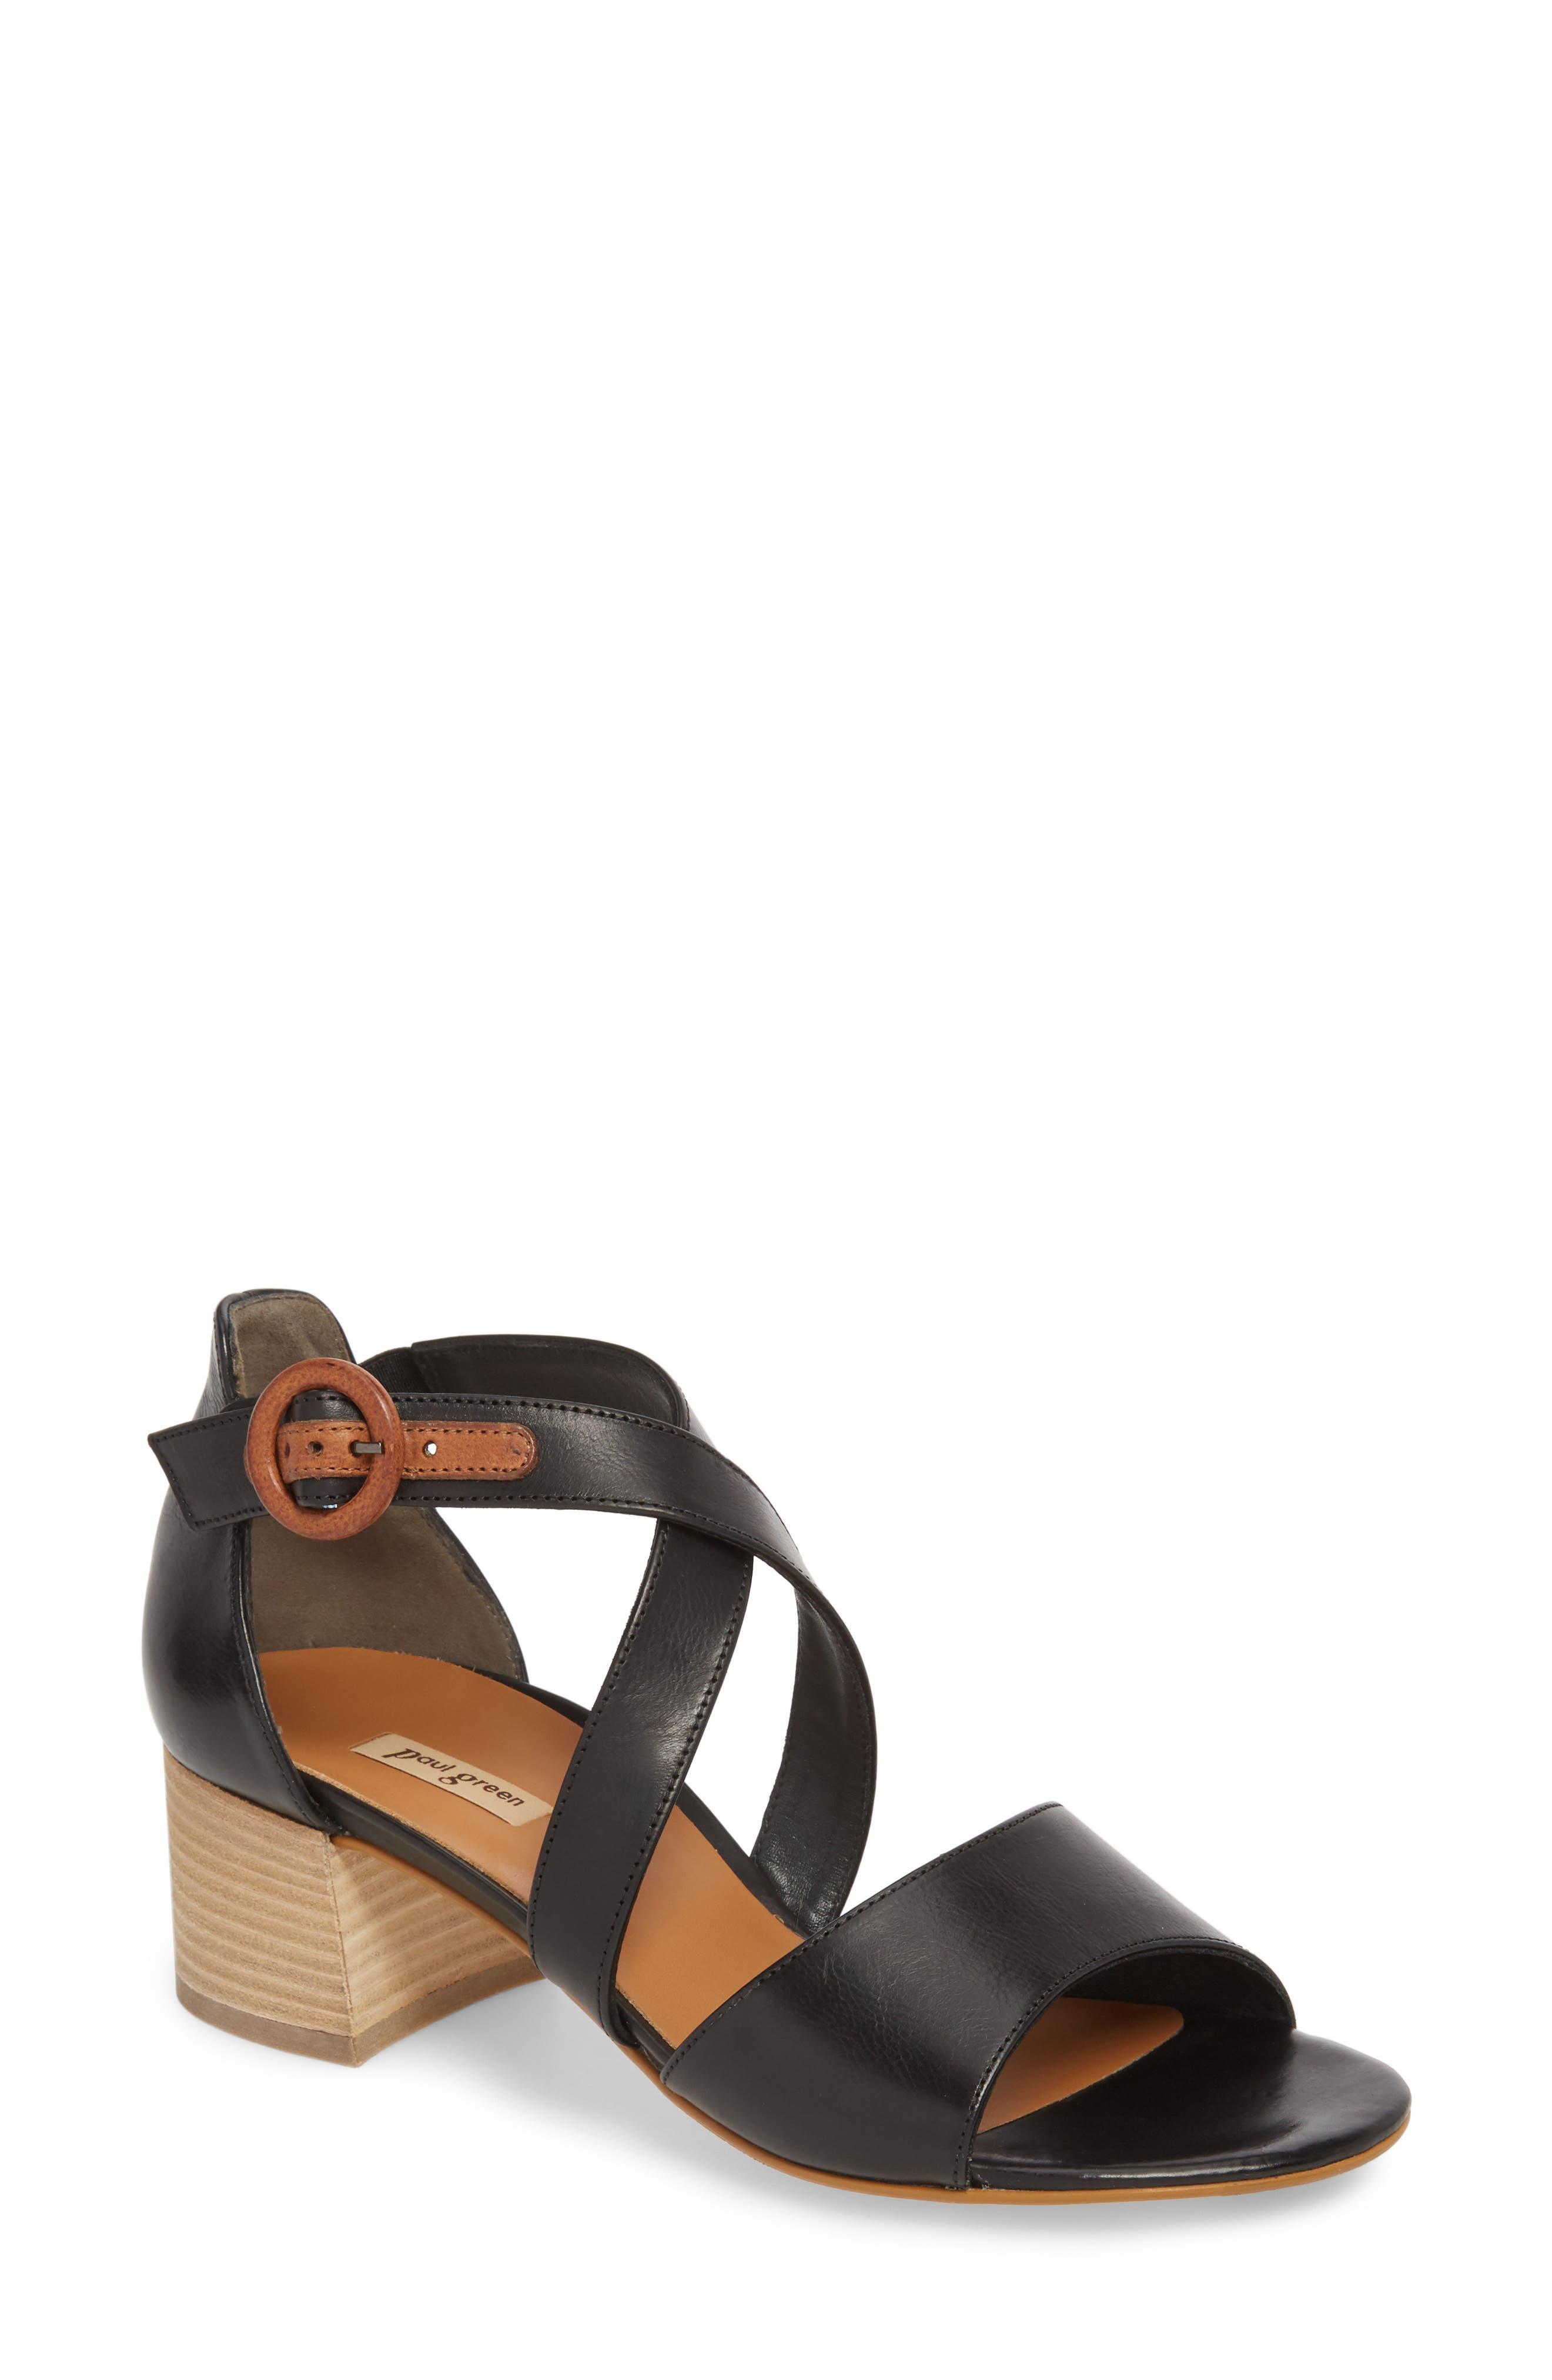 Sally Quarter Strap Sandal,                         Main,                         color, Black Leather